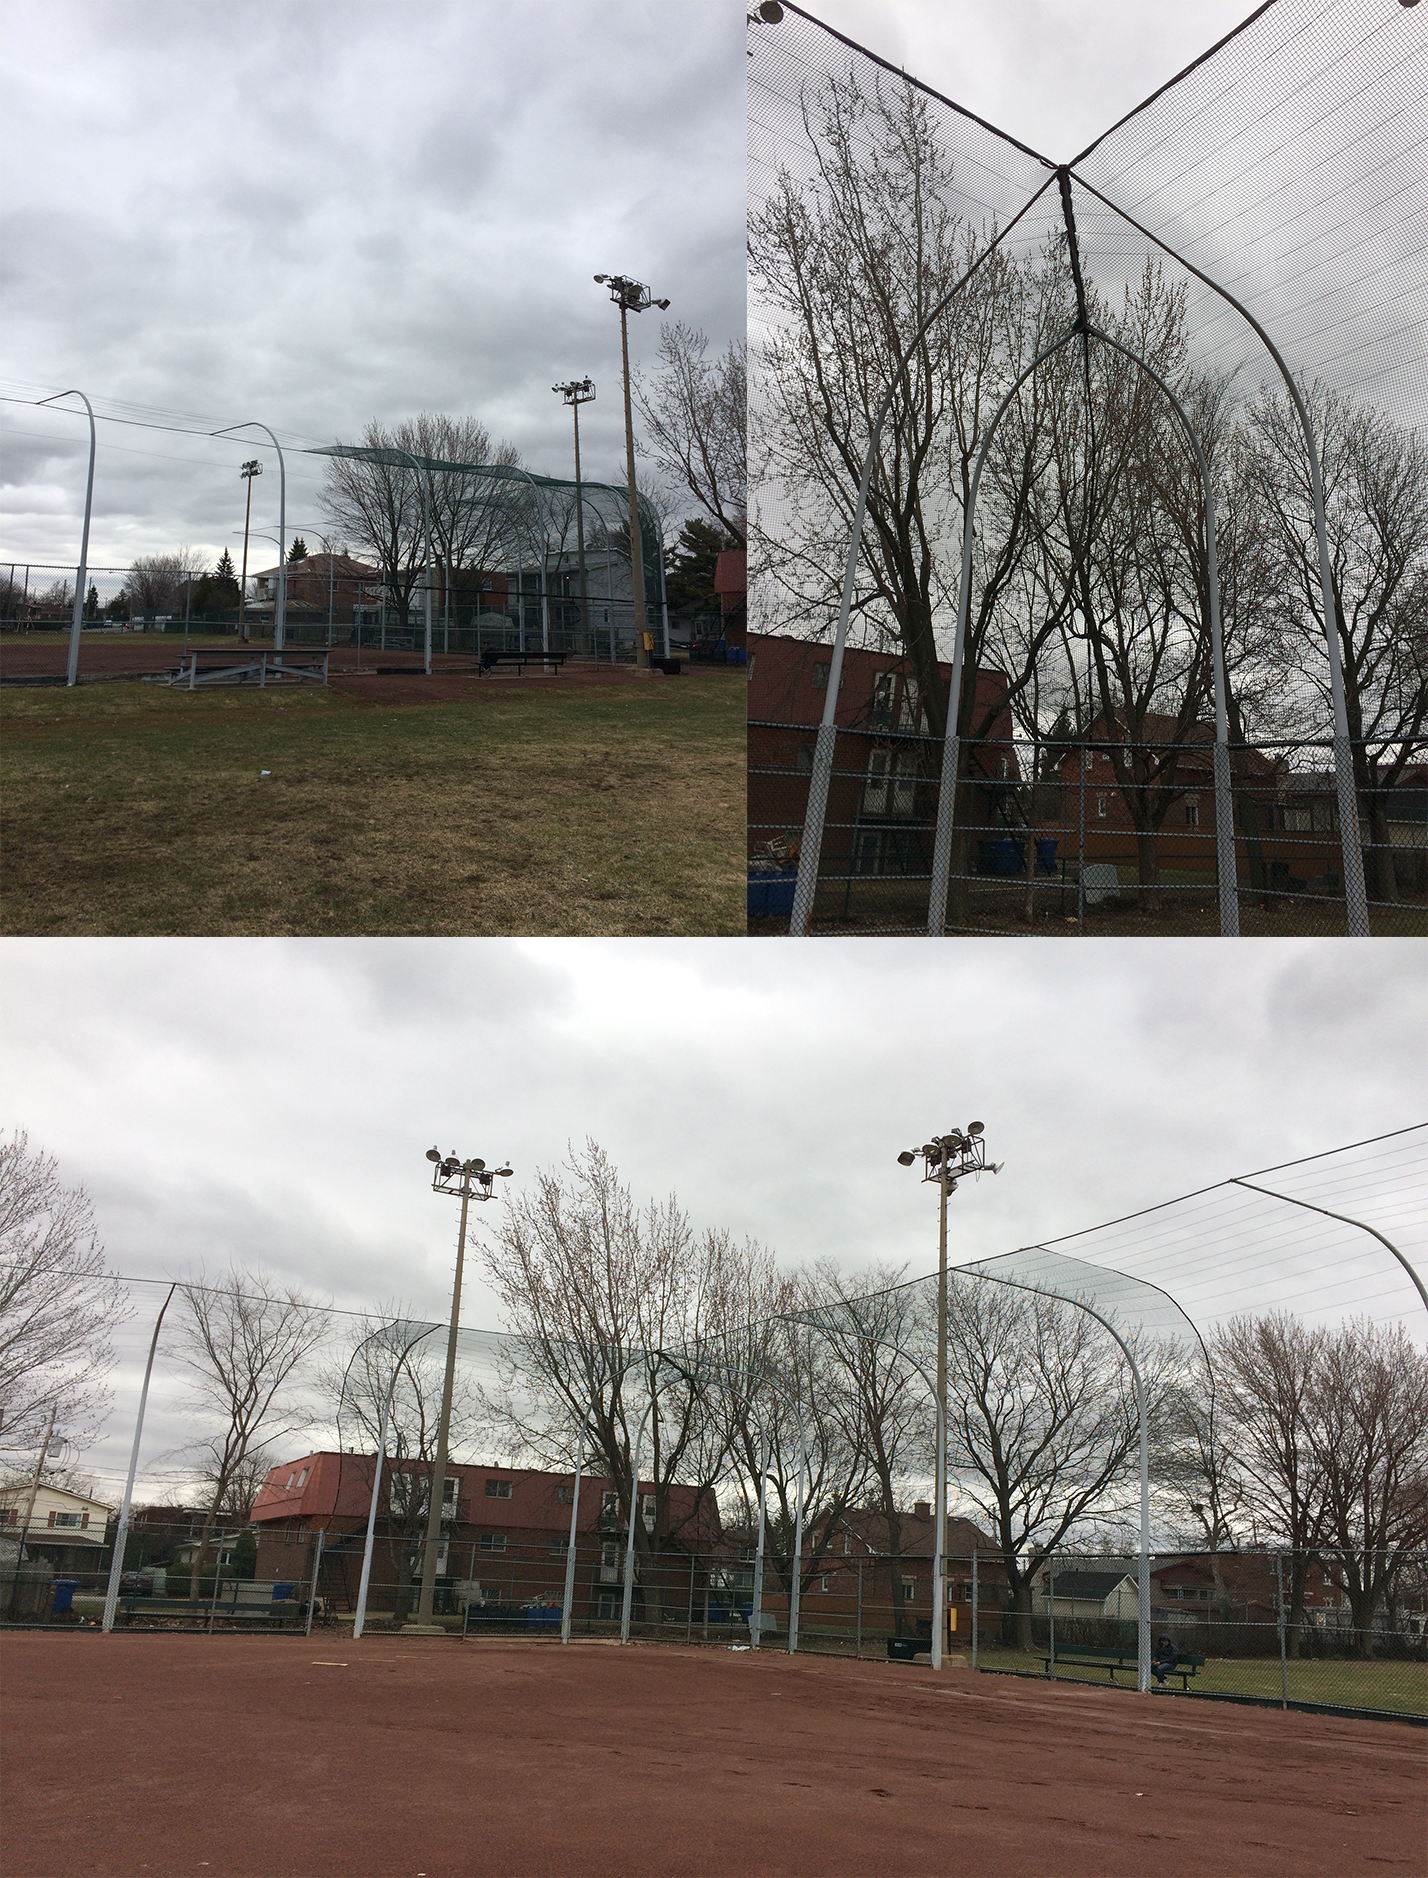 baseball-diamond-netting-barrier-Longueuil-quebec.png